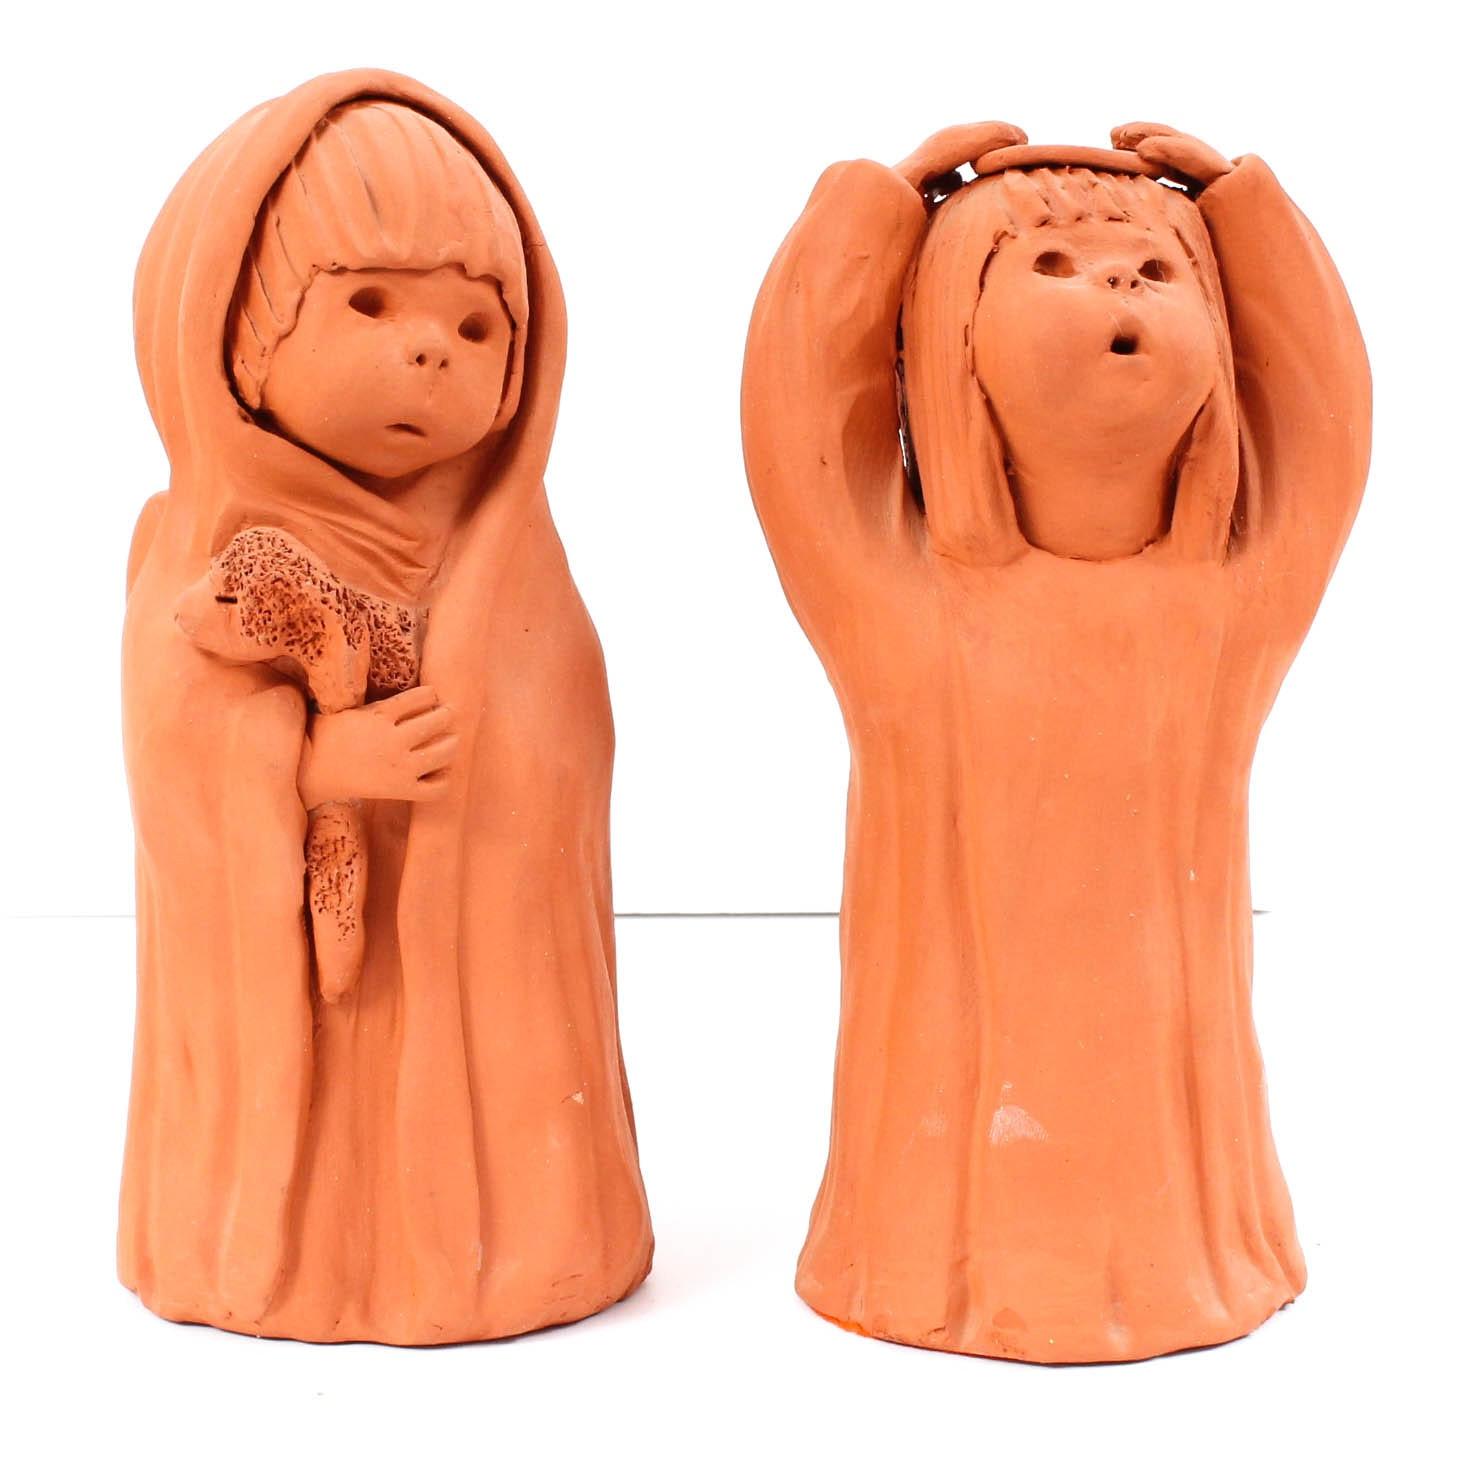 Ann Entis Terracotta Sculptures